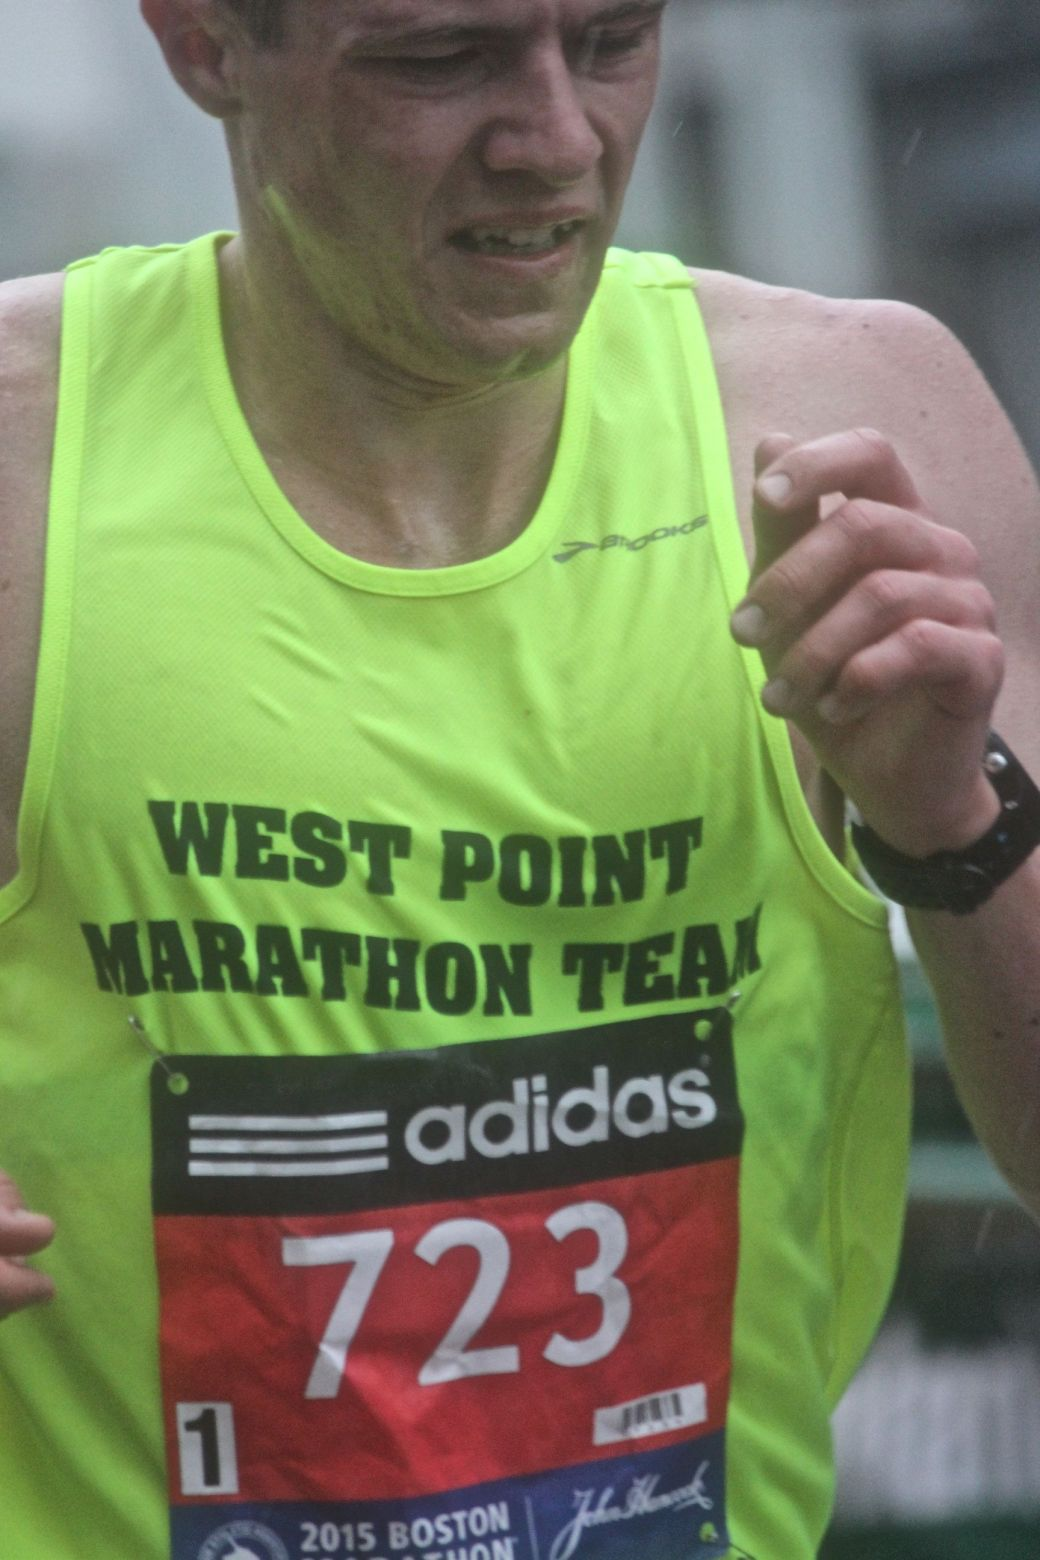 boston marathon april 20 2015 racer number 723